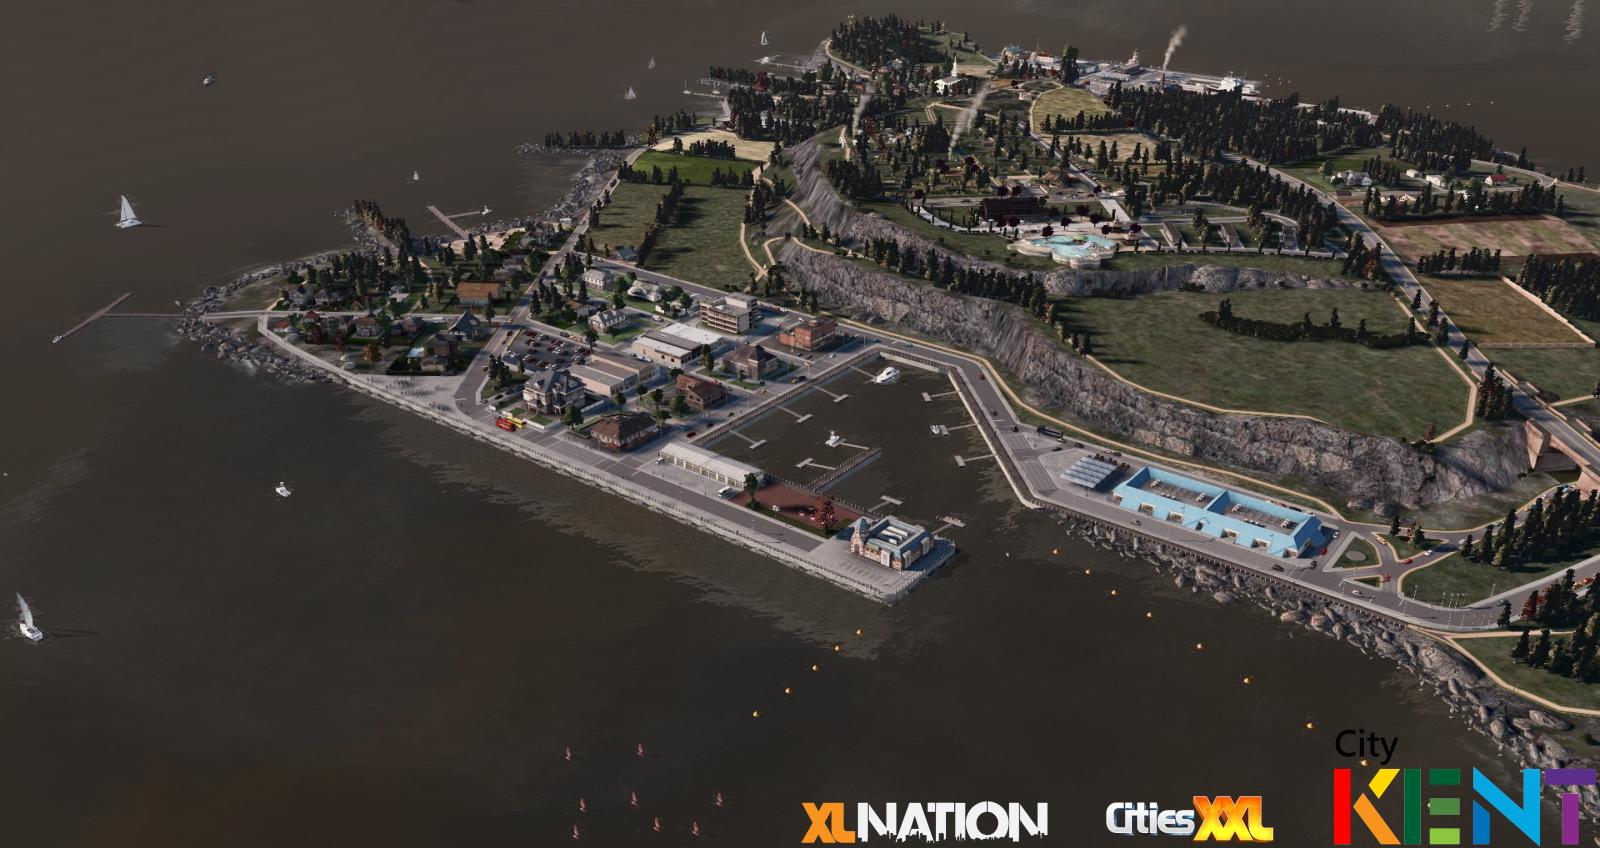 [Cities XXL] Kent - Page 2 Abraham-island_kent09_xln_citiesxxl-jpg